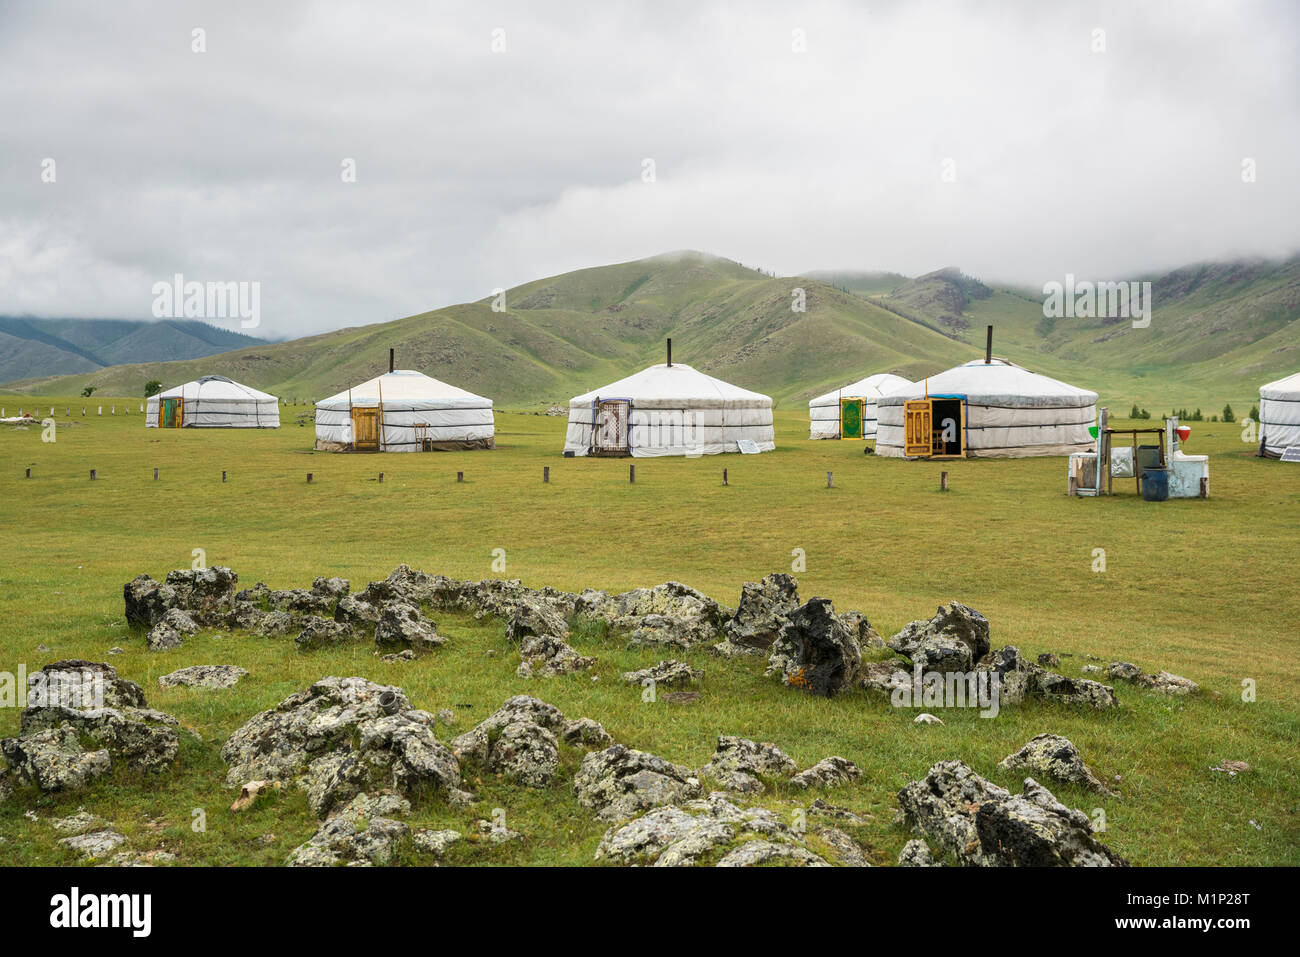 Famiglia nomade ger camp, Orkhon valley, Sud provincia Hangay, Mongolia, Asia Centrale, Asia Immagini Stock